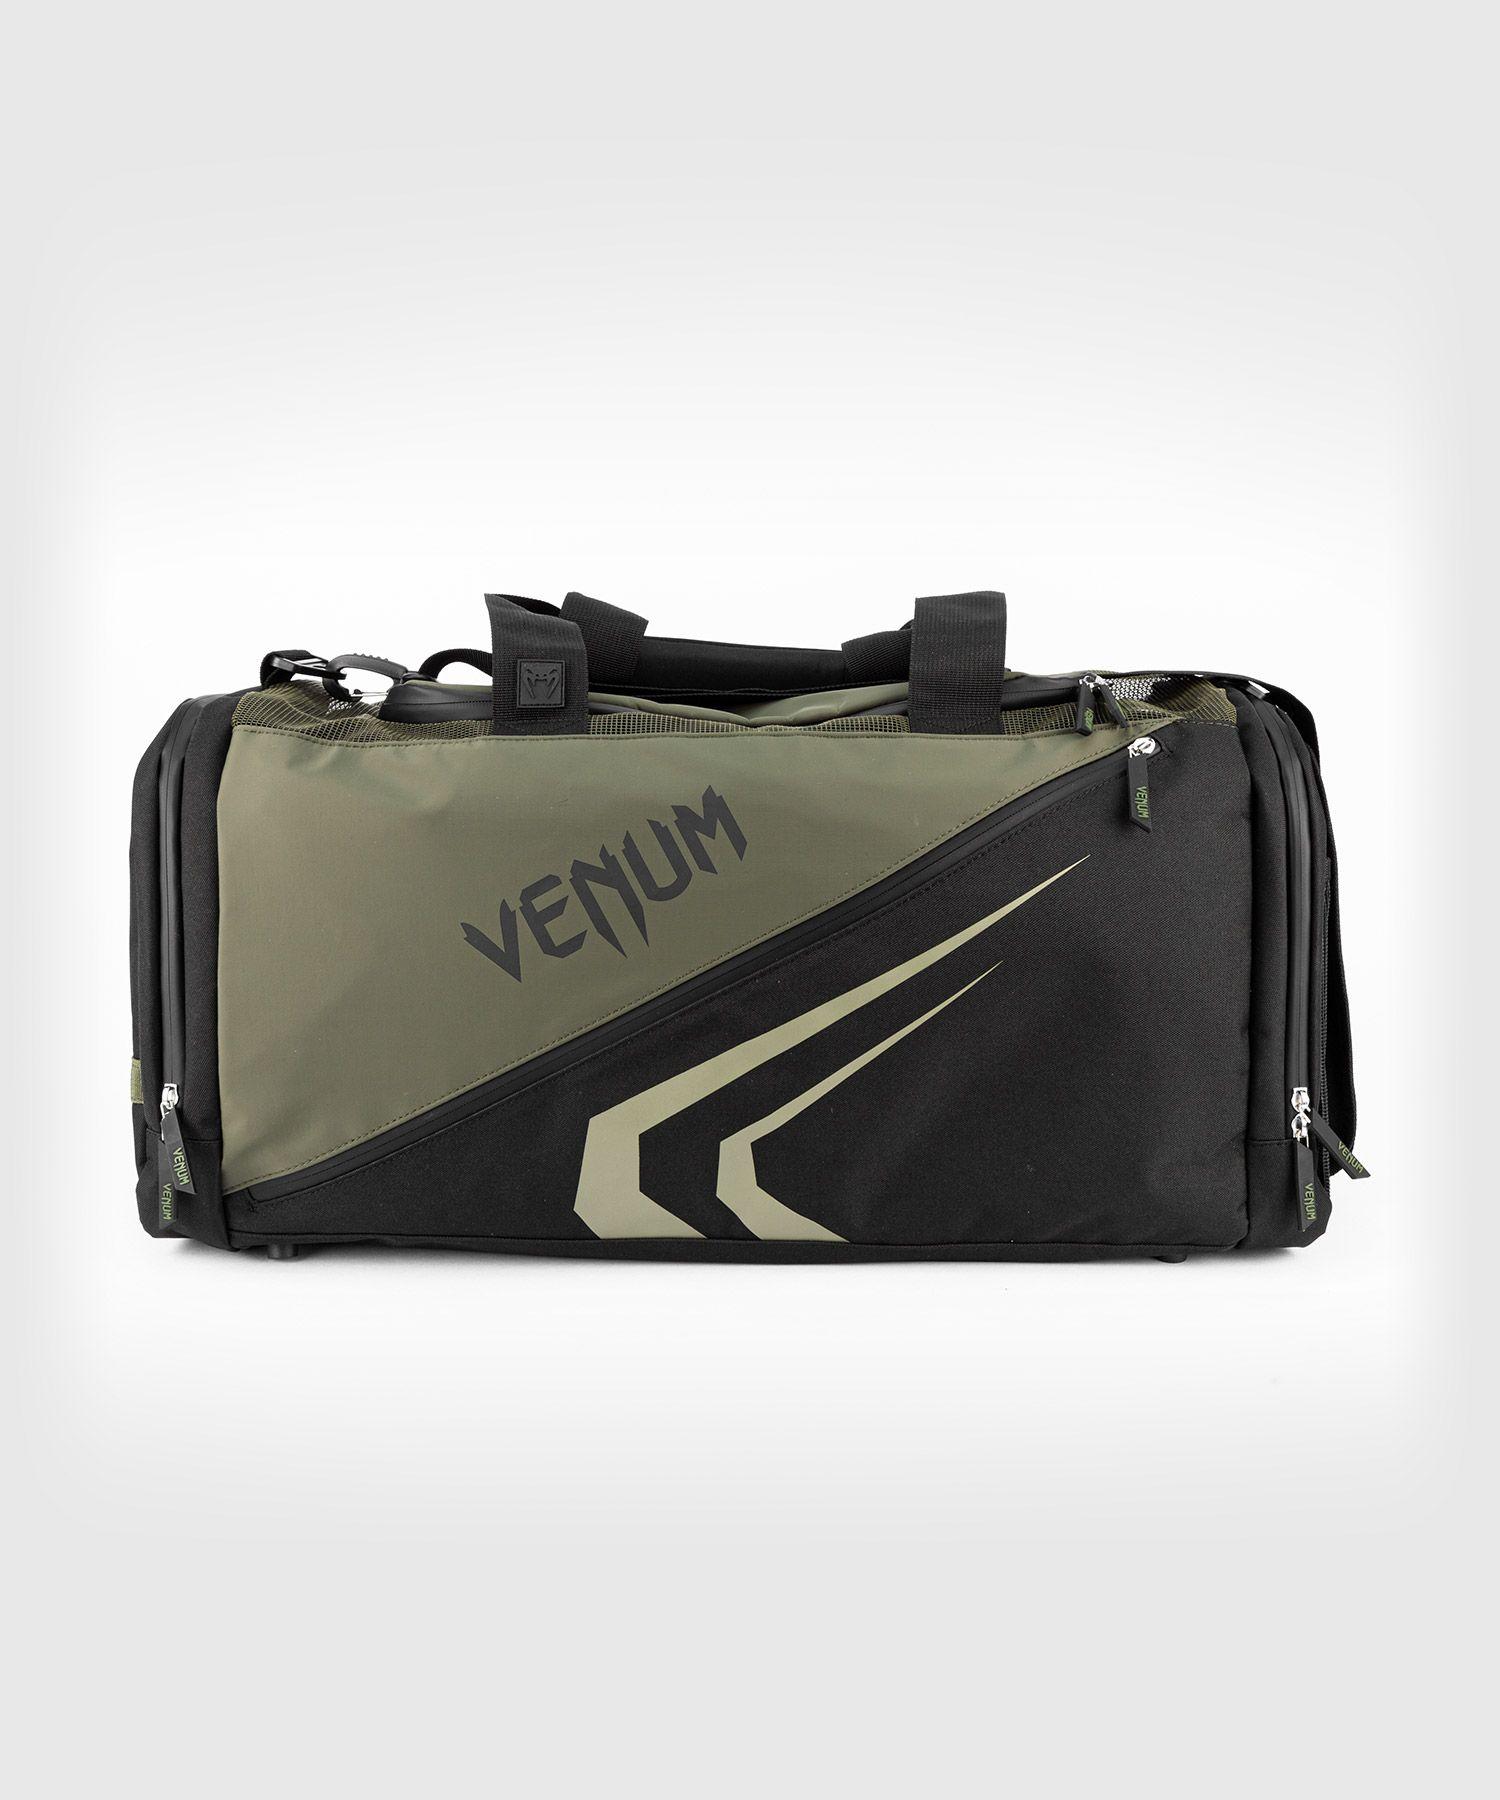 Sac de sport Venum trainer lite EVO Kaki